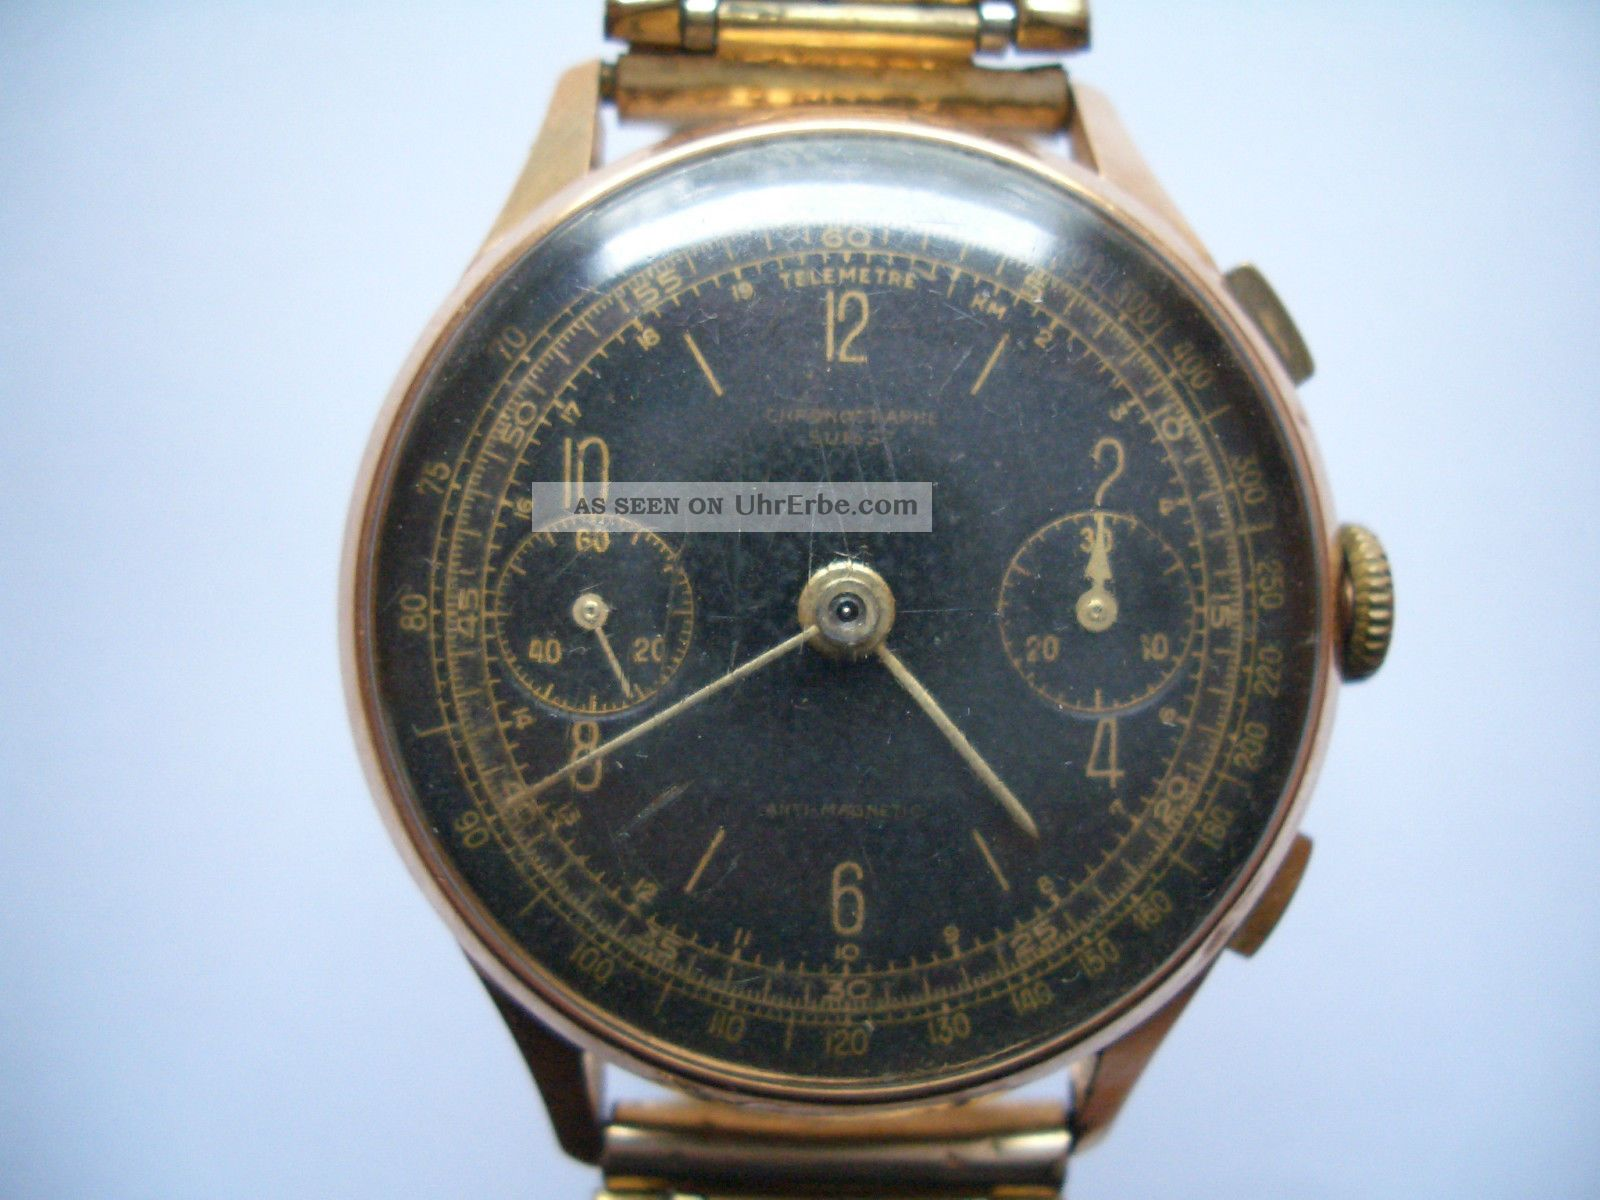 18k 750er Gold Armbanduhr Chronographe Suisse Armbanduhren Bild